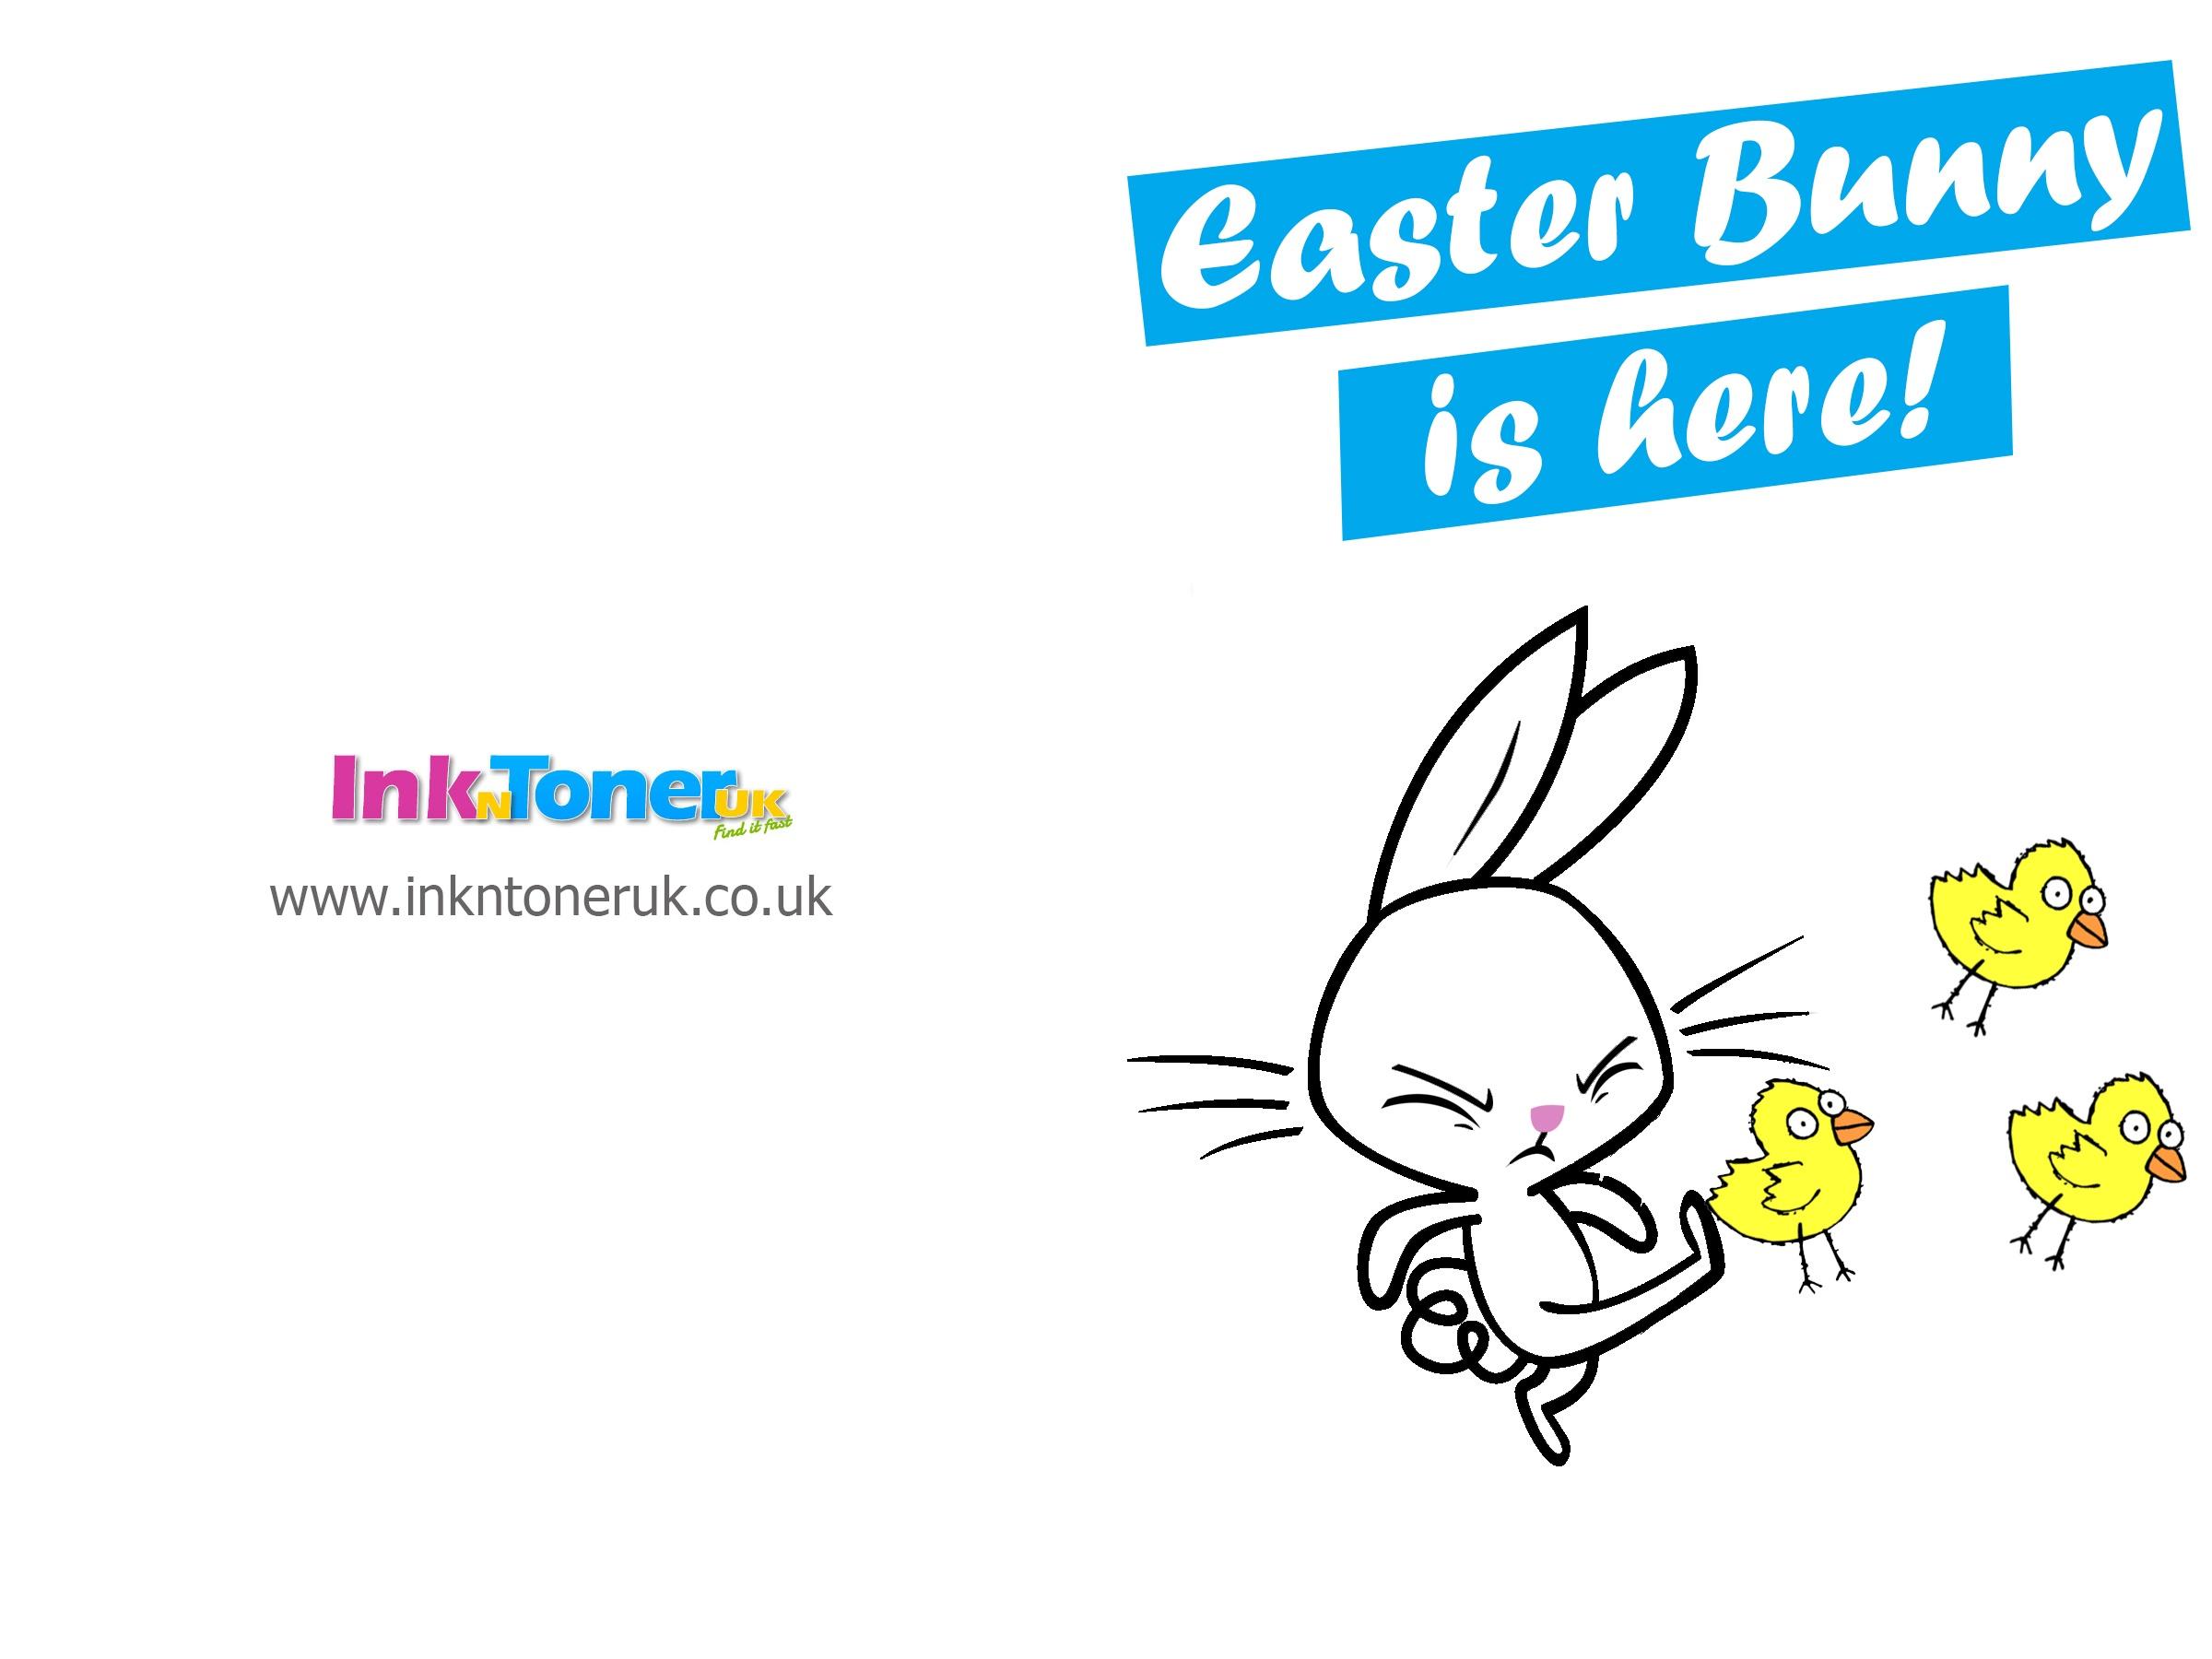 Free Printable Easter Cards | Inkntoneruk Blog - Free Printable Easter Cards